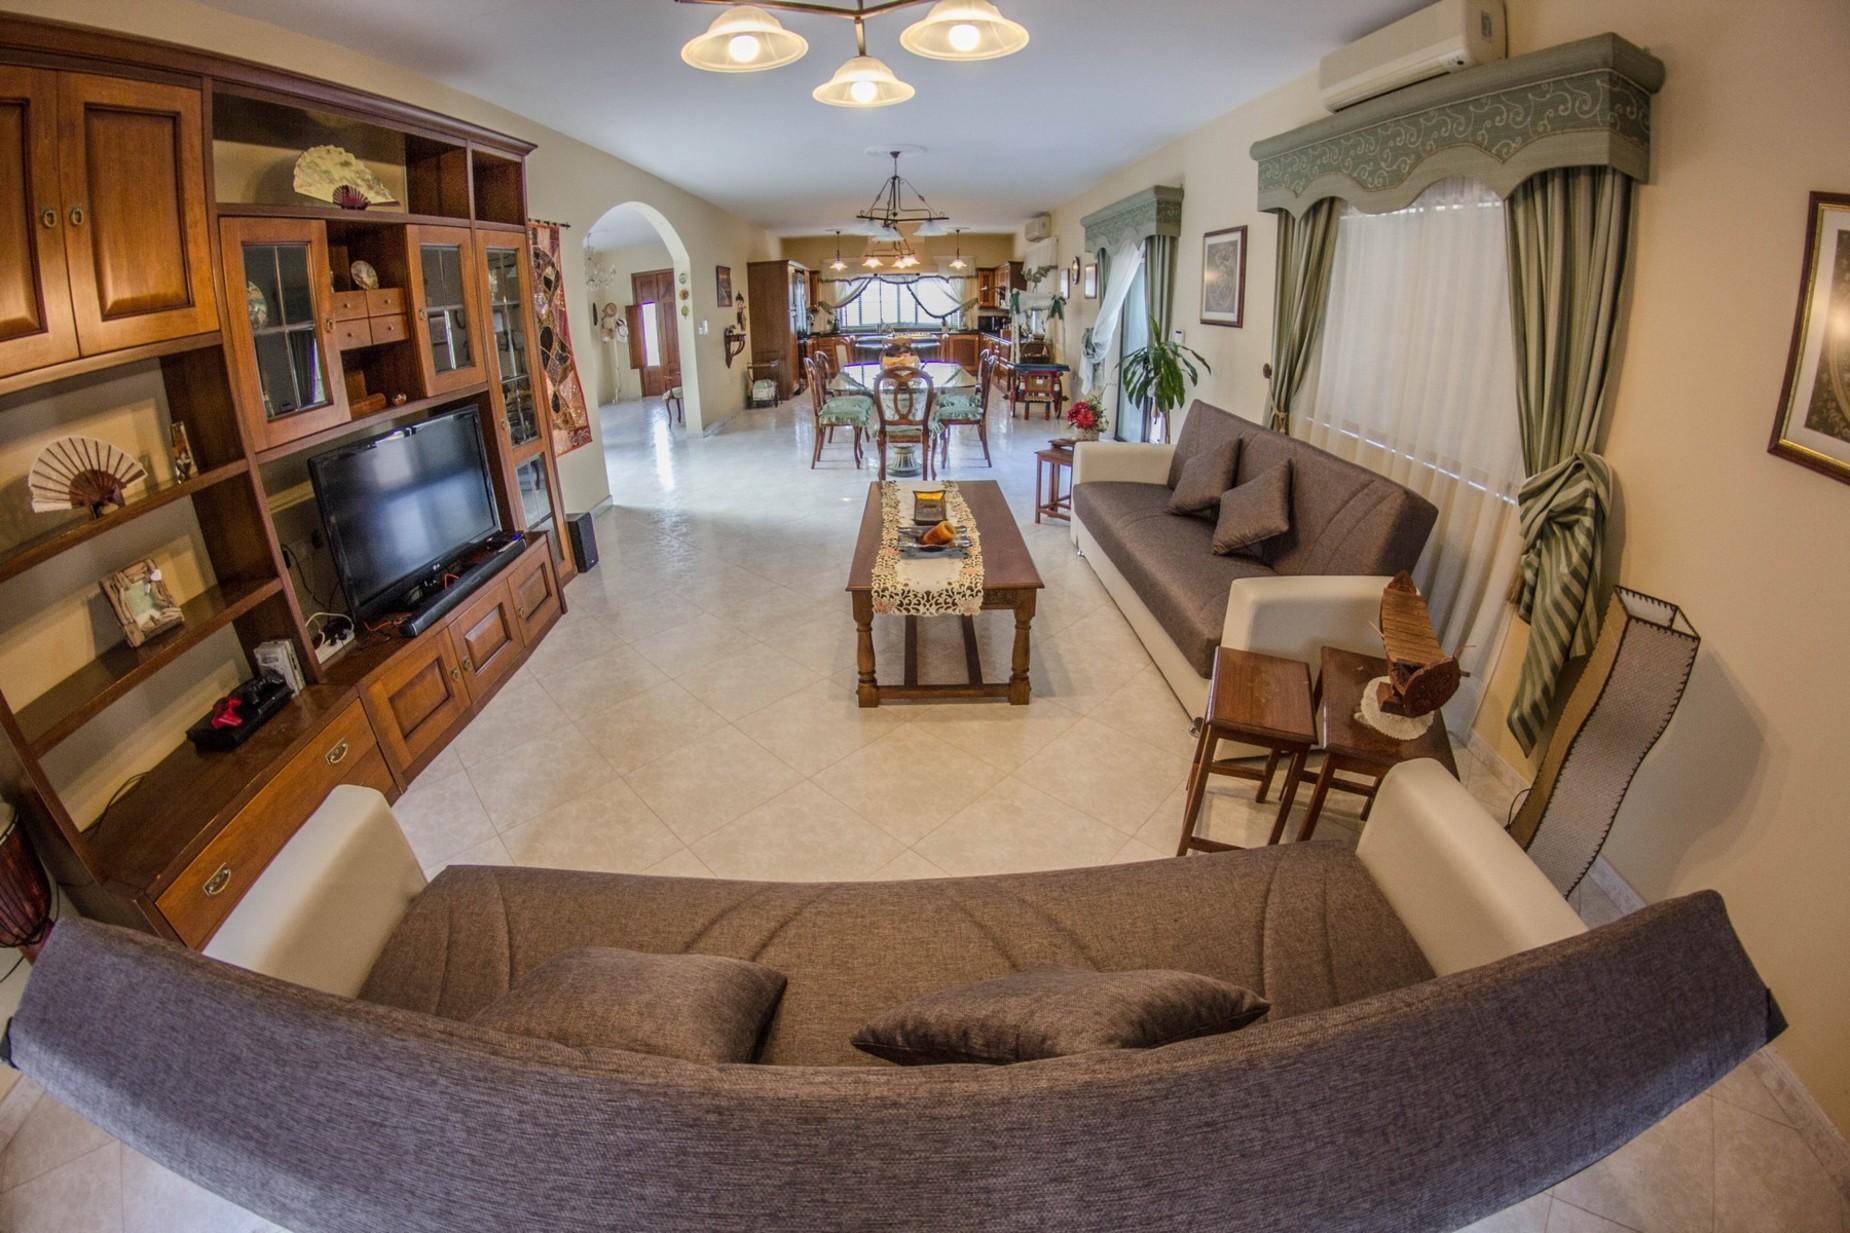 6 bed Villa For Rent in Mellieha, Mellieha - thumb 4